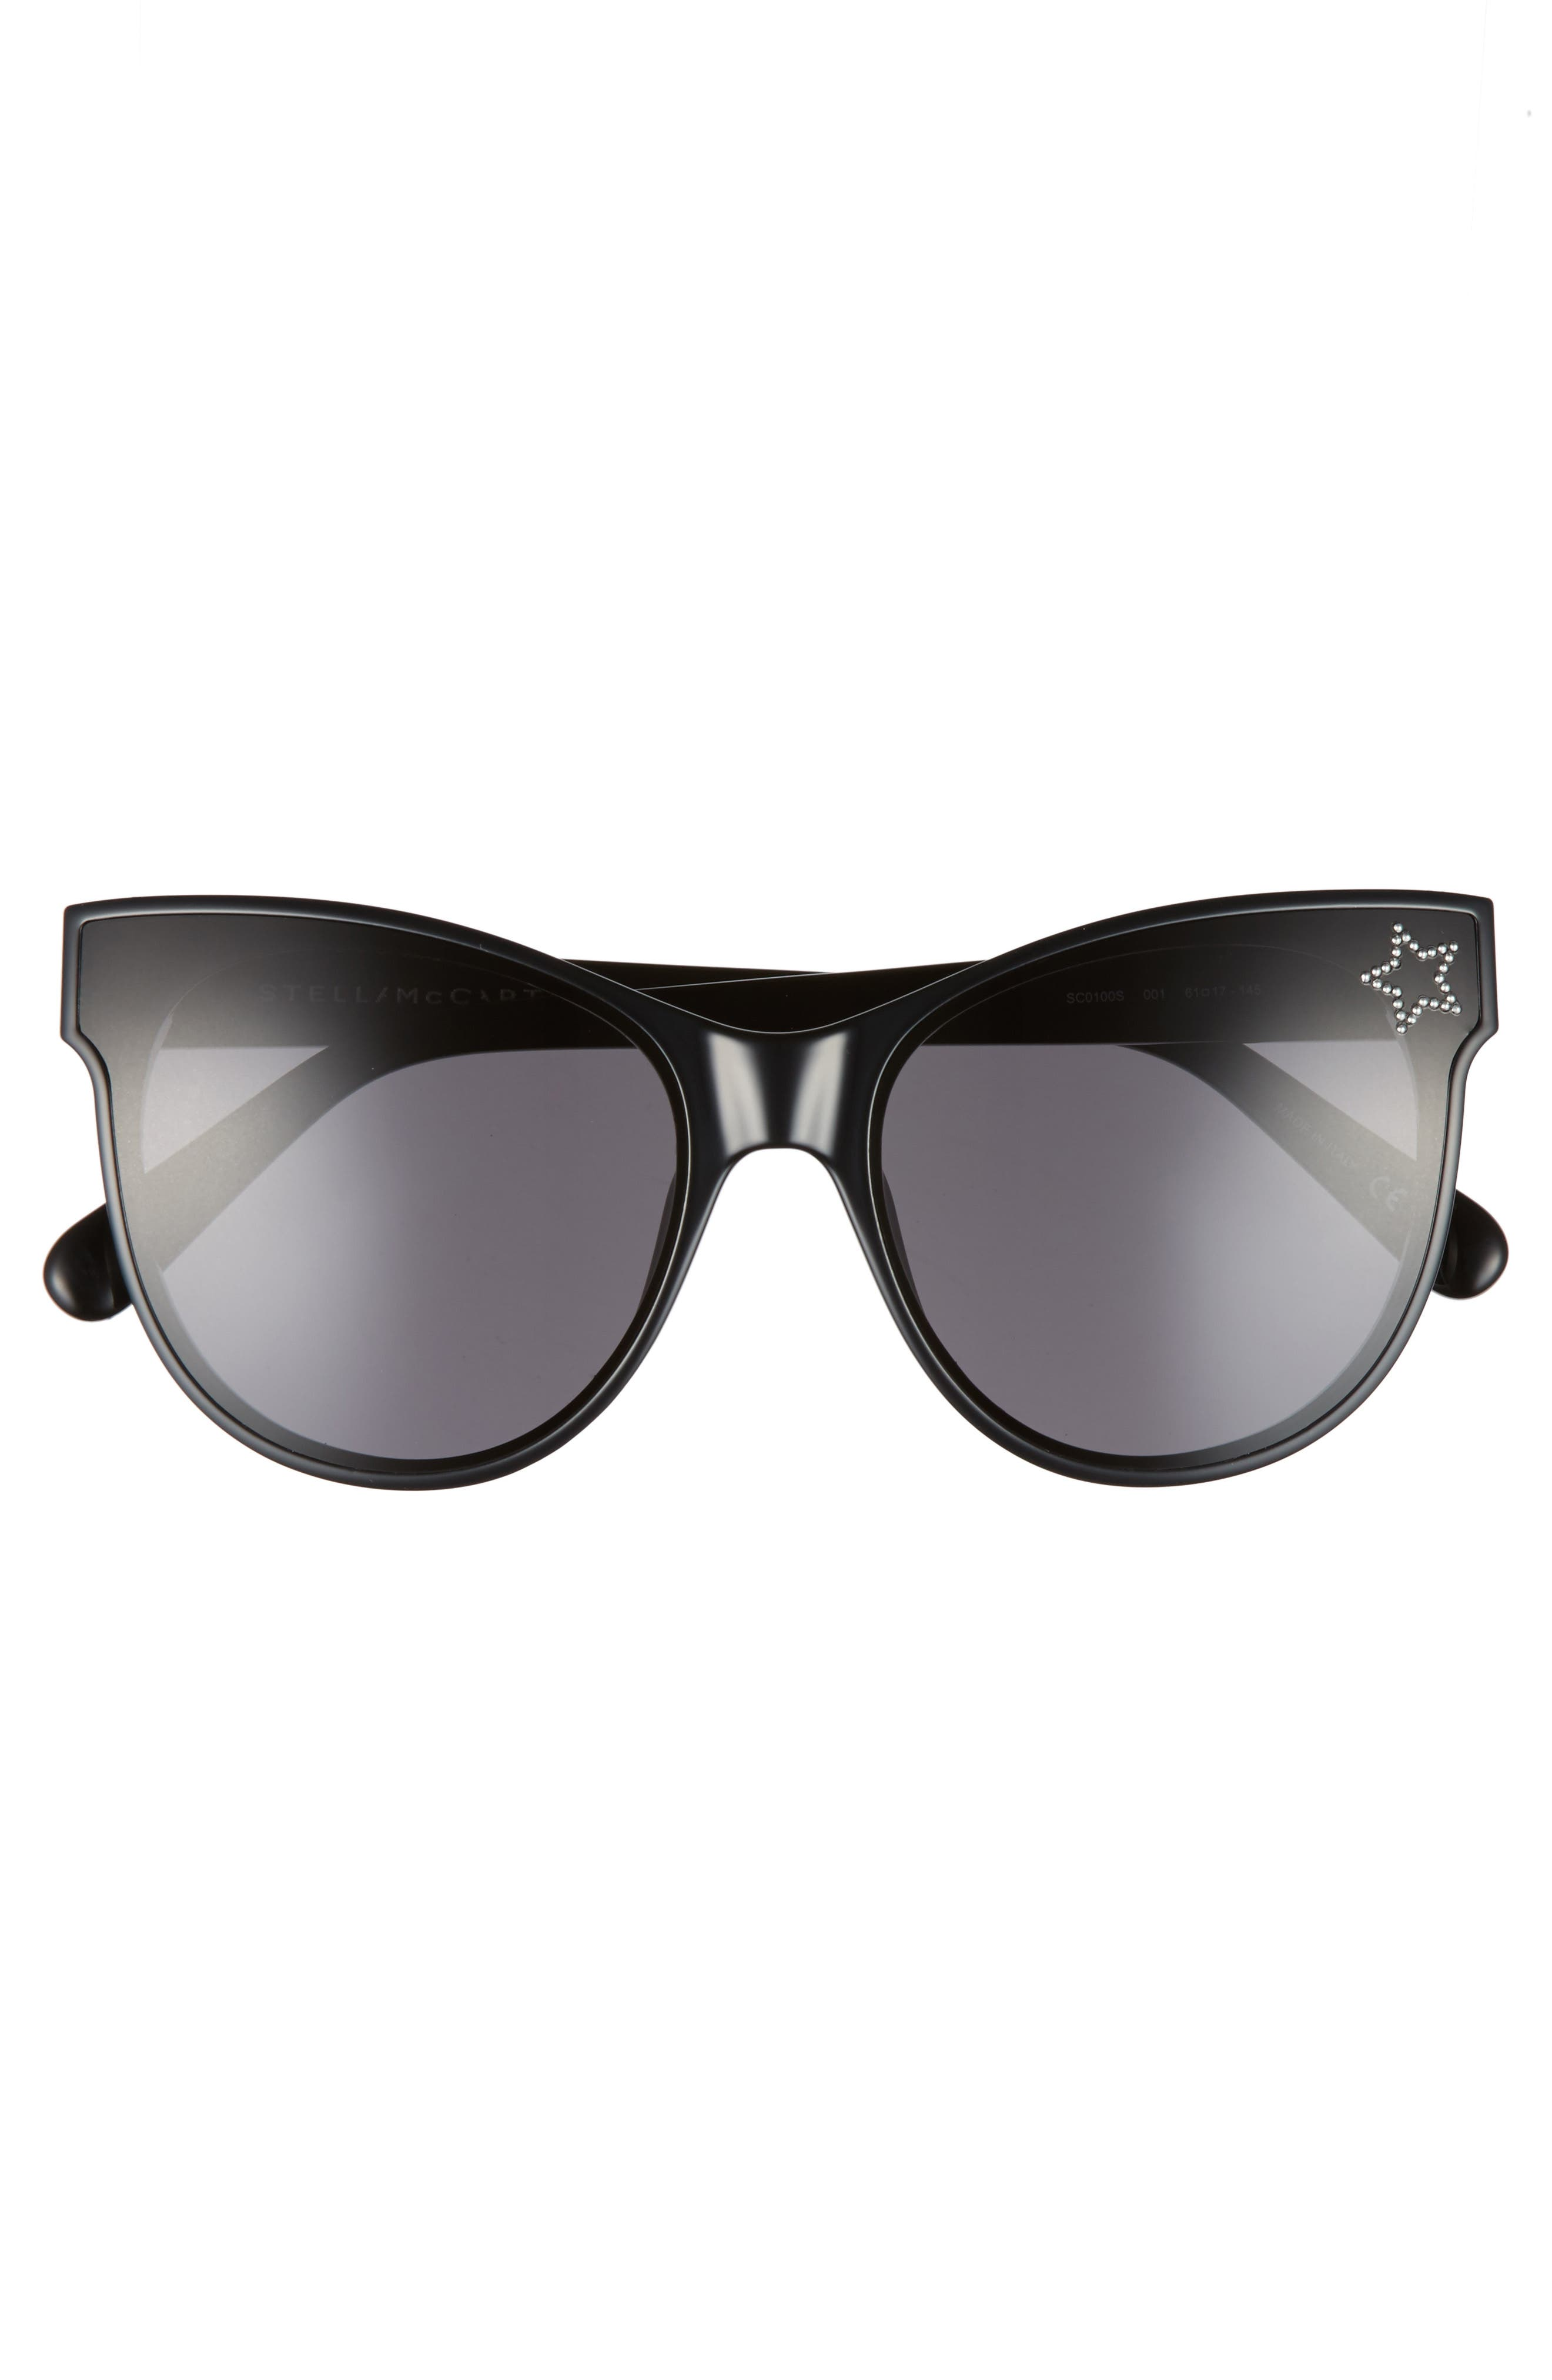 61mm Cat Eye Sunglasses,                             Alternate thumbnail 3, color,                             BLACK